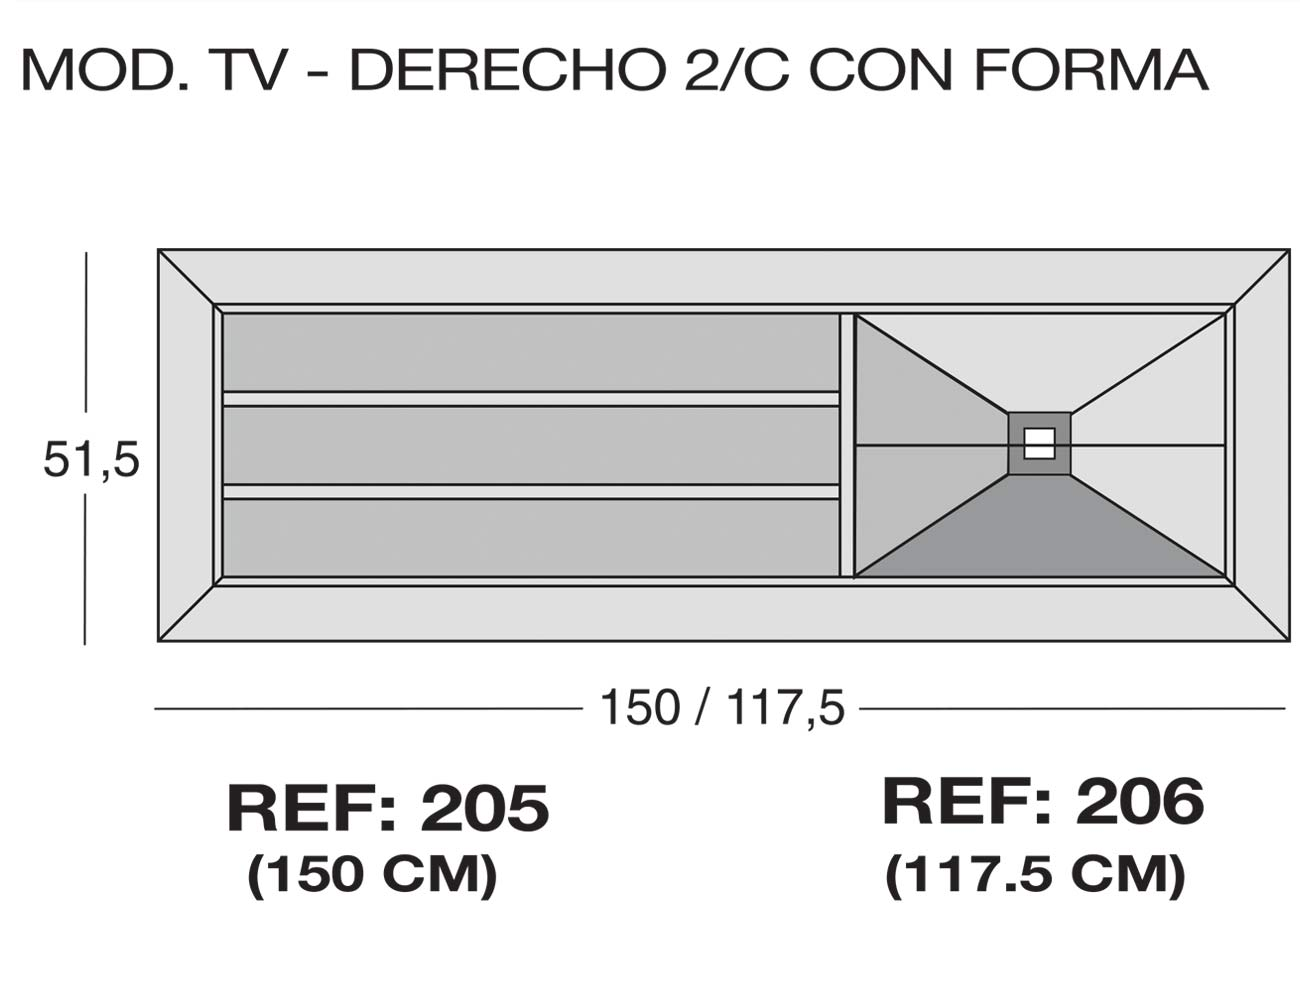 Modulo tv derecho 2 c forma 205 2061